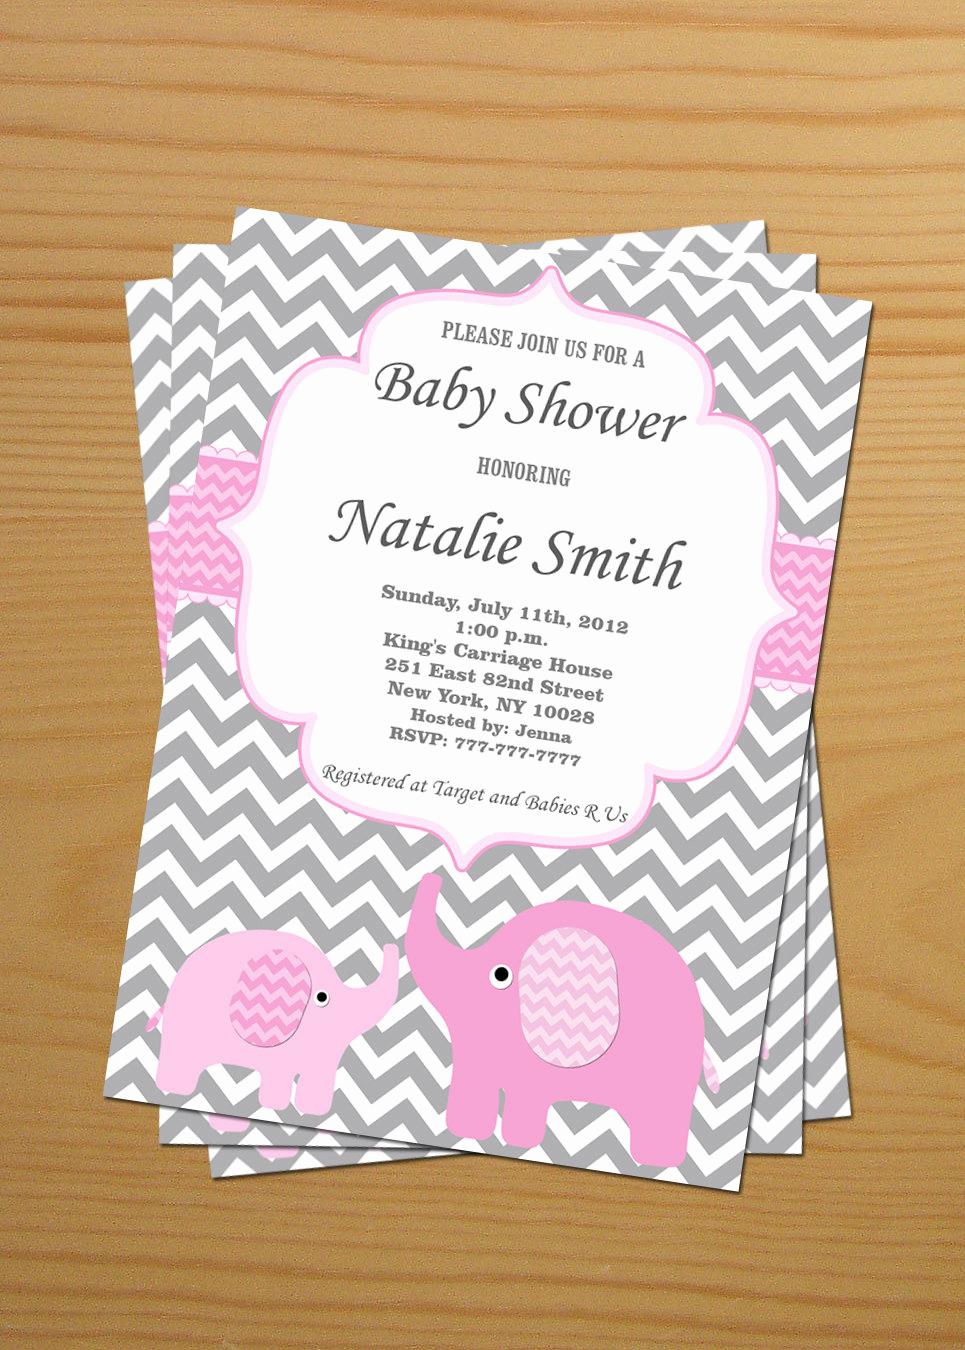 Girl Baby Shower Invitation New Baby Shower Invitation Elephant Baby Shower Invitation Girl